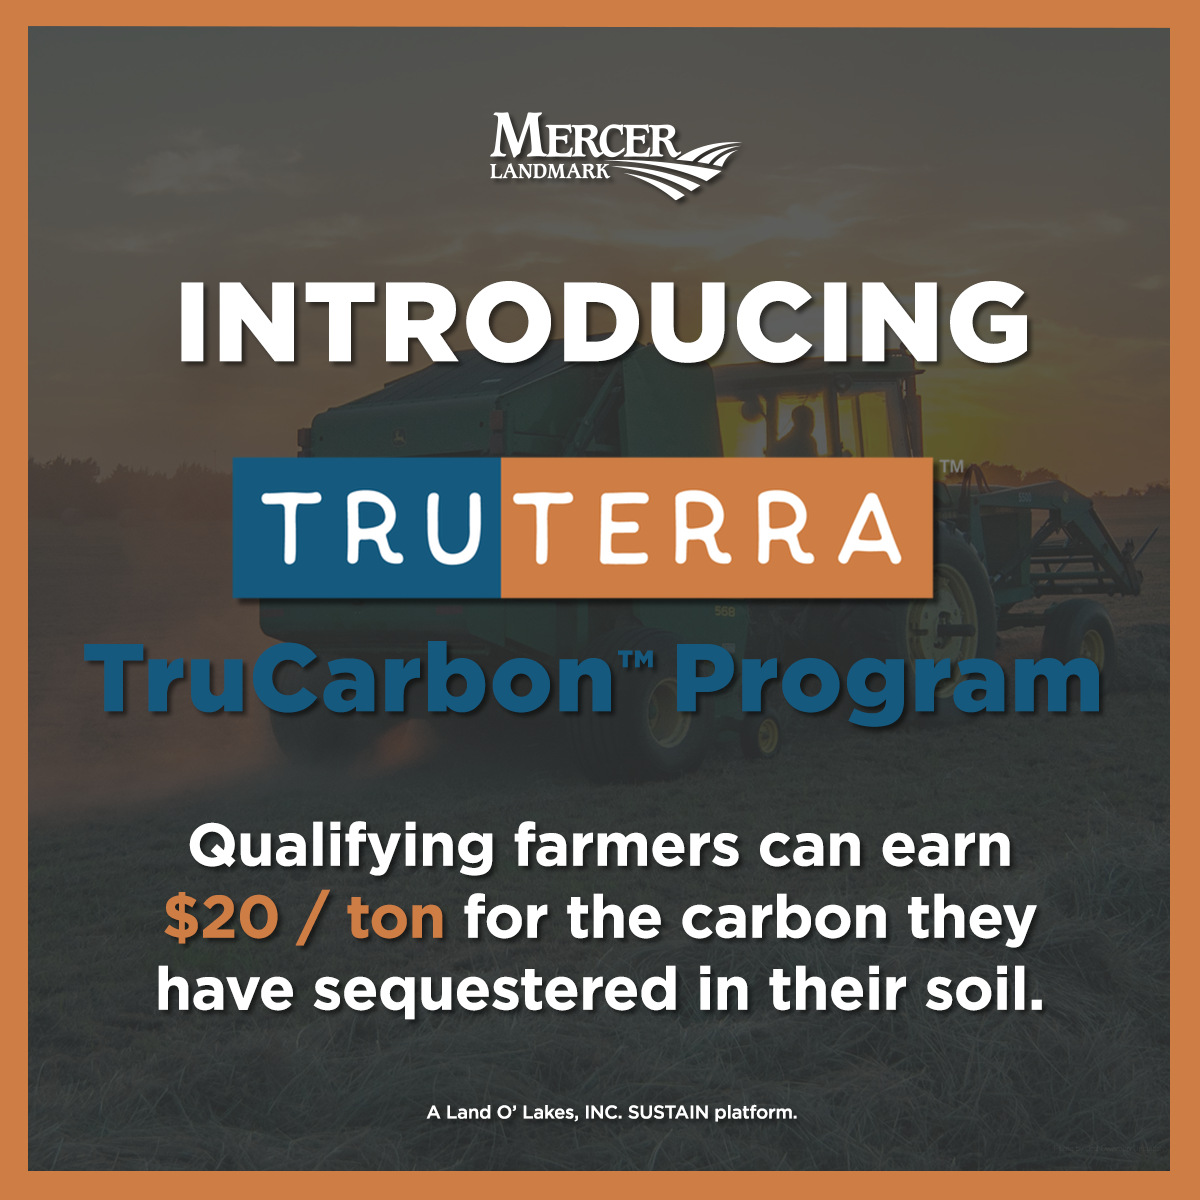 Introducing the NEW TruCarbon™ Program through Truterra